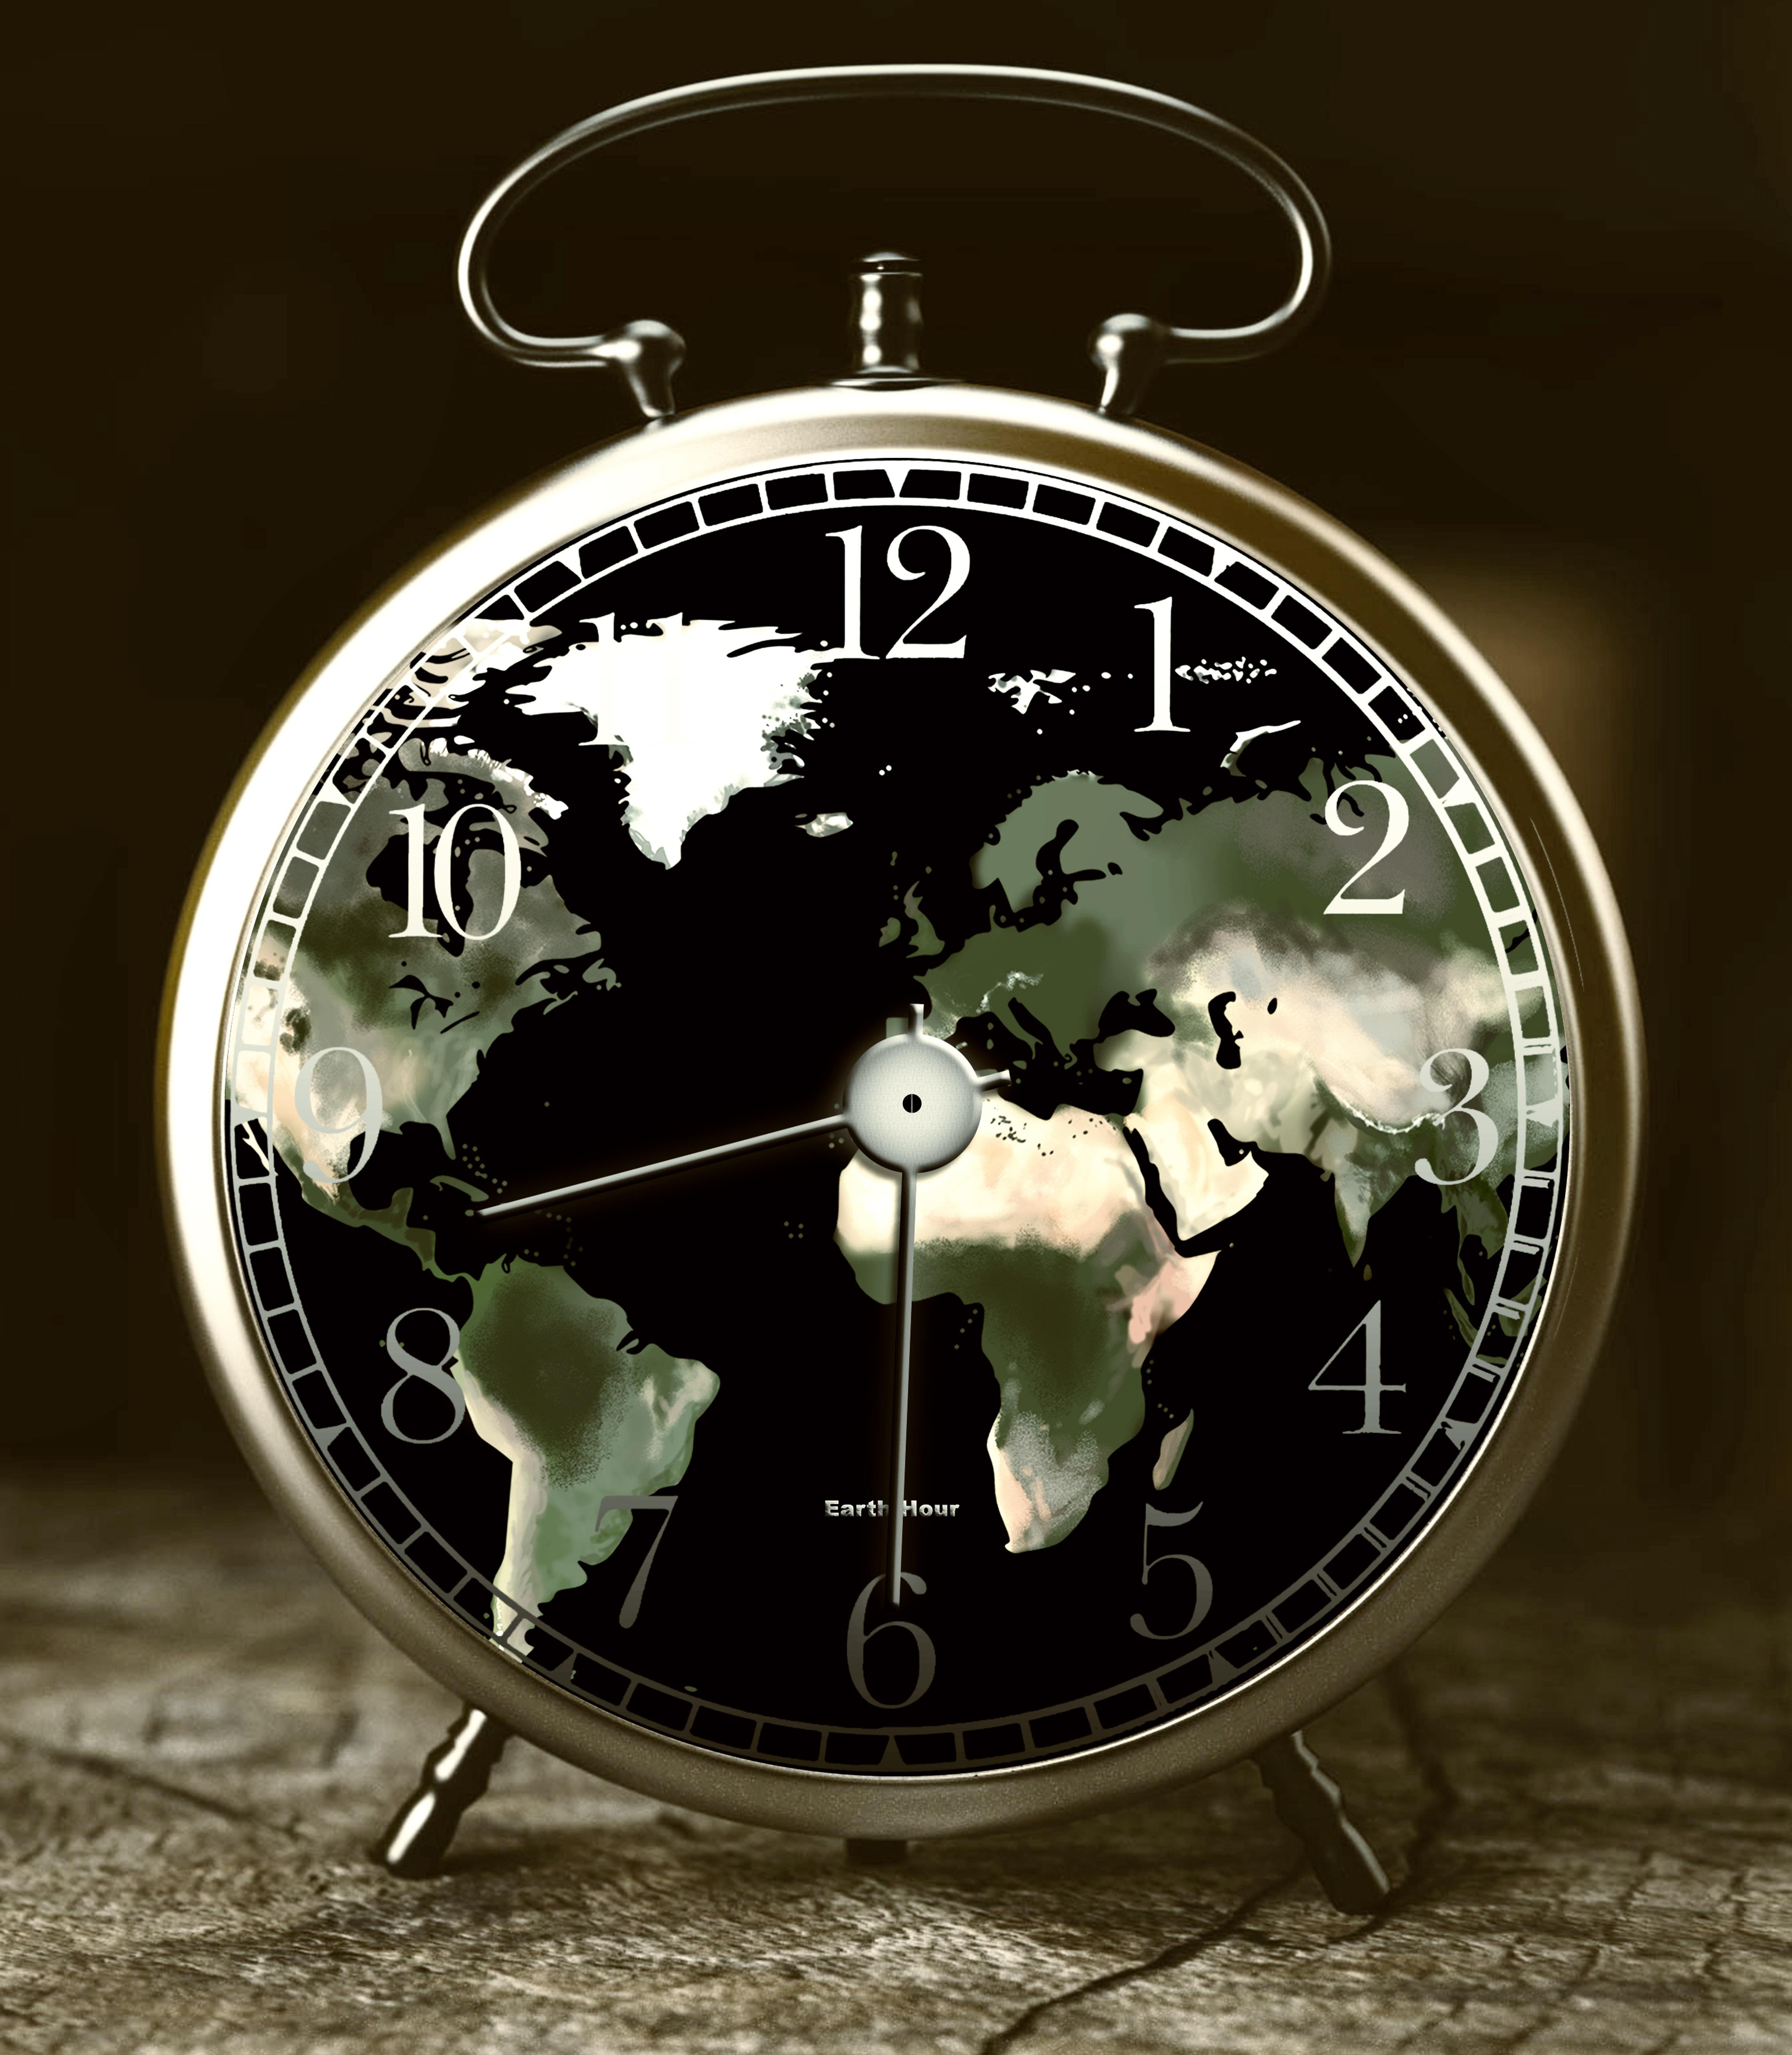 earth hour, earth rhitzung, climate crisis